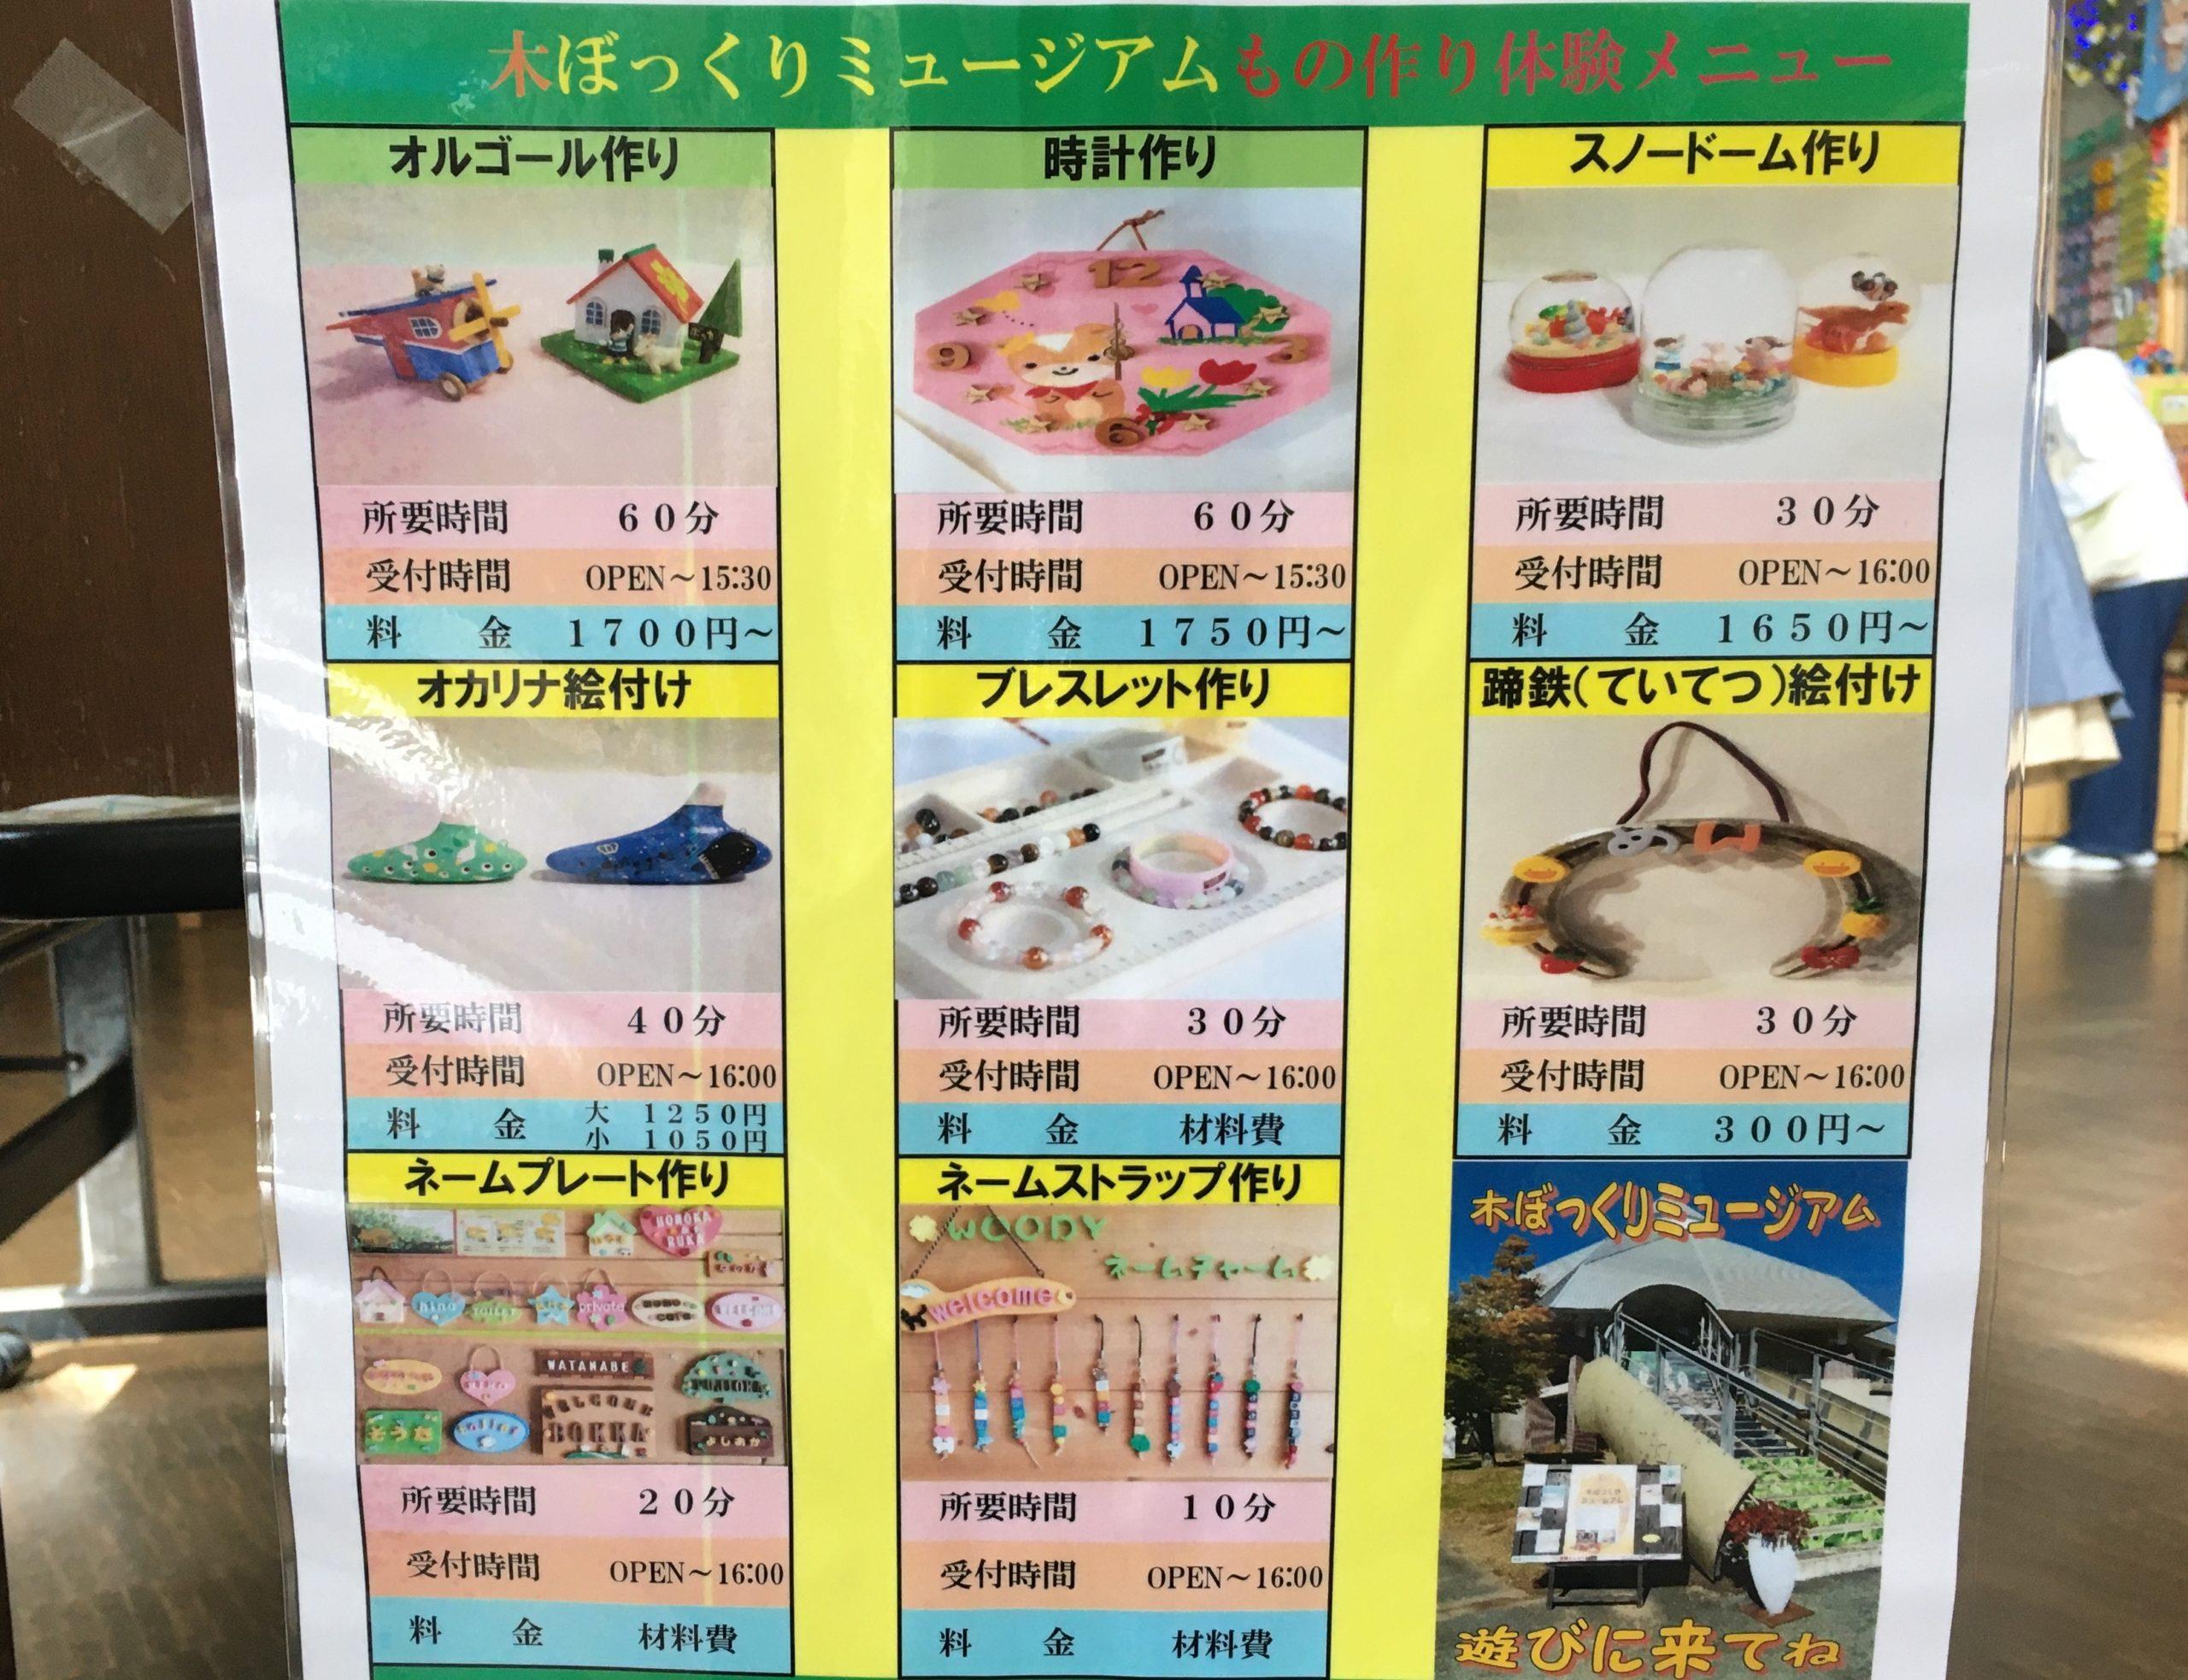 bokkanosato-kuchikomi